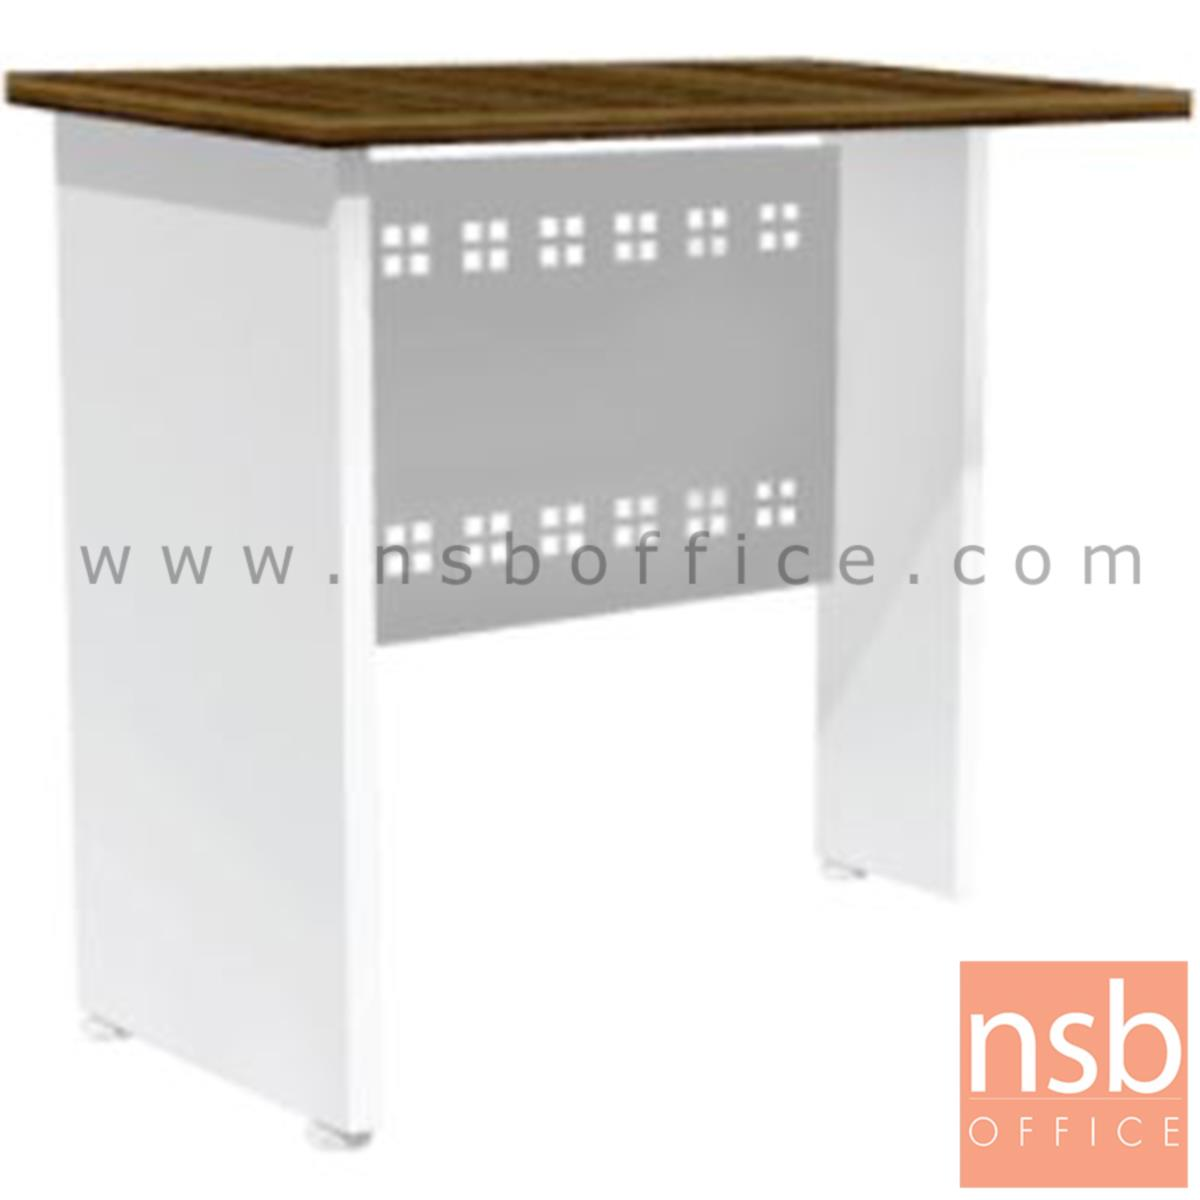 A34A027:โต๊ะเข้ามุม  รุ่น Cribbie (คลิบบี้) ขนาด 80W cm. พร้อมบังโป๊เหล็ก สีซีบราโน่-ขาว